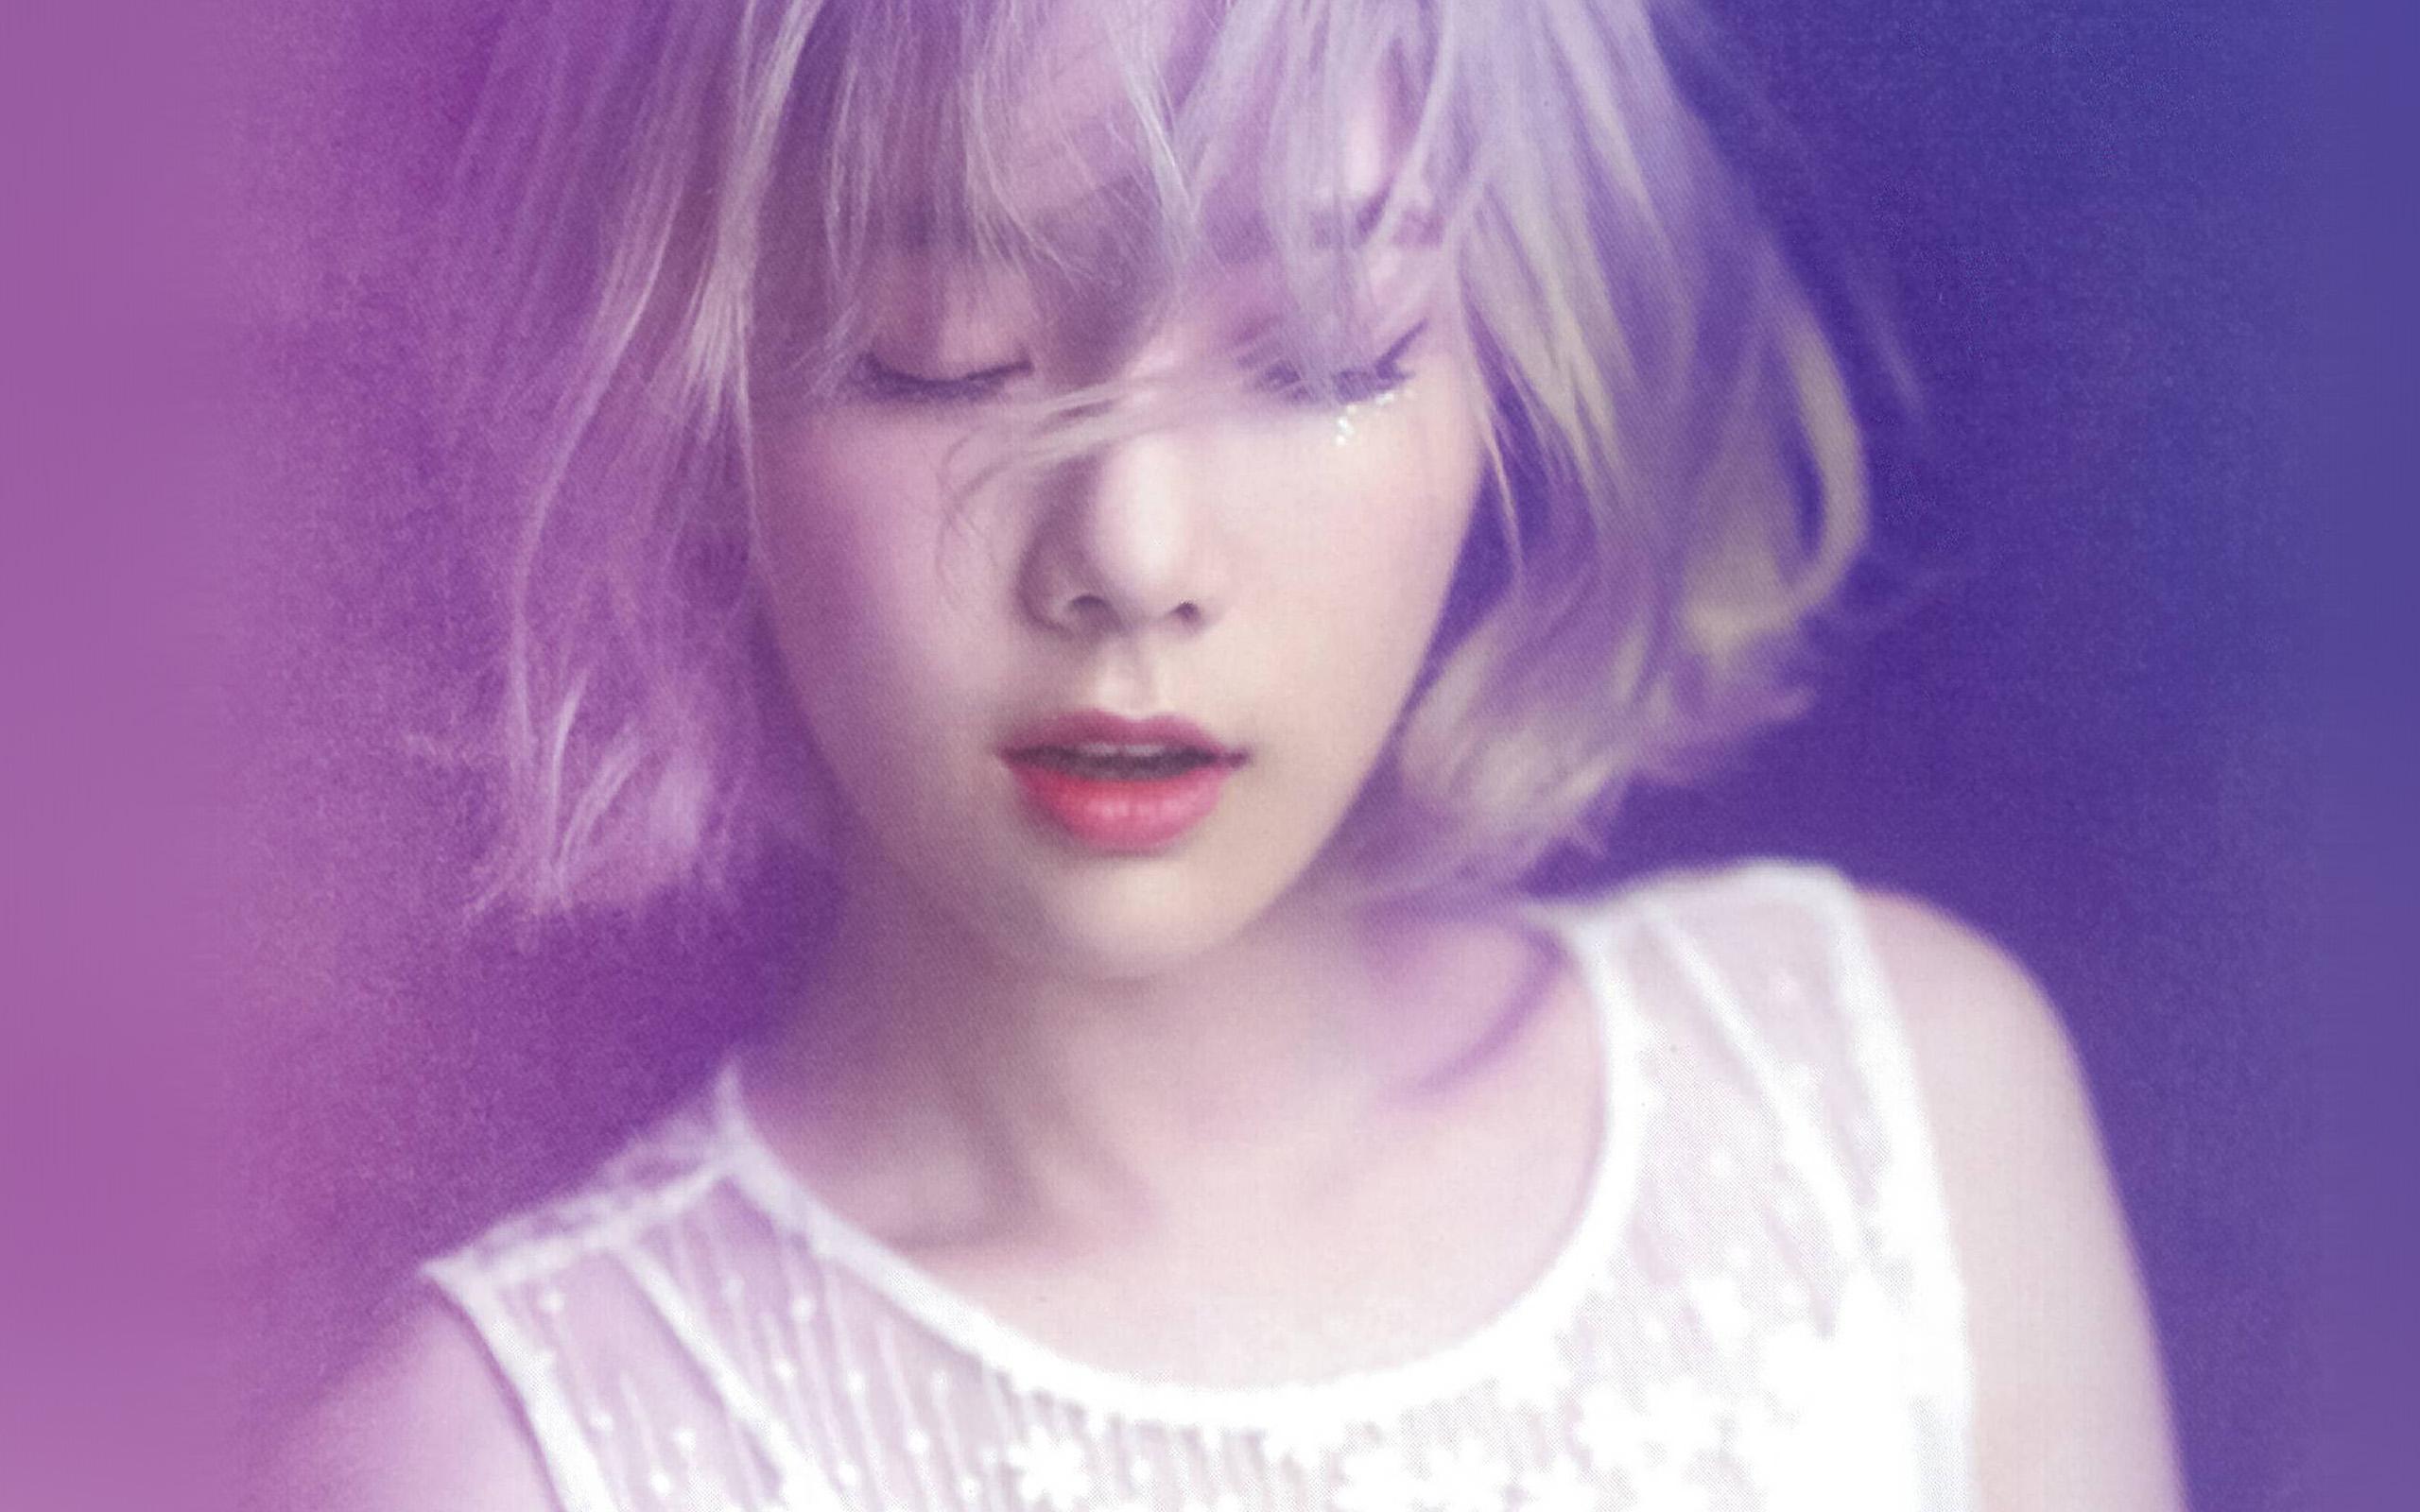 Wallpaper Girl Pink Iphone Wallpaper For Desktop Laptop Hl10 Taeyeon Kpop Snsd